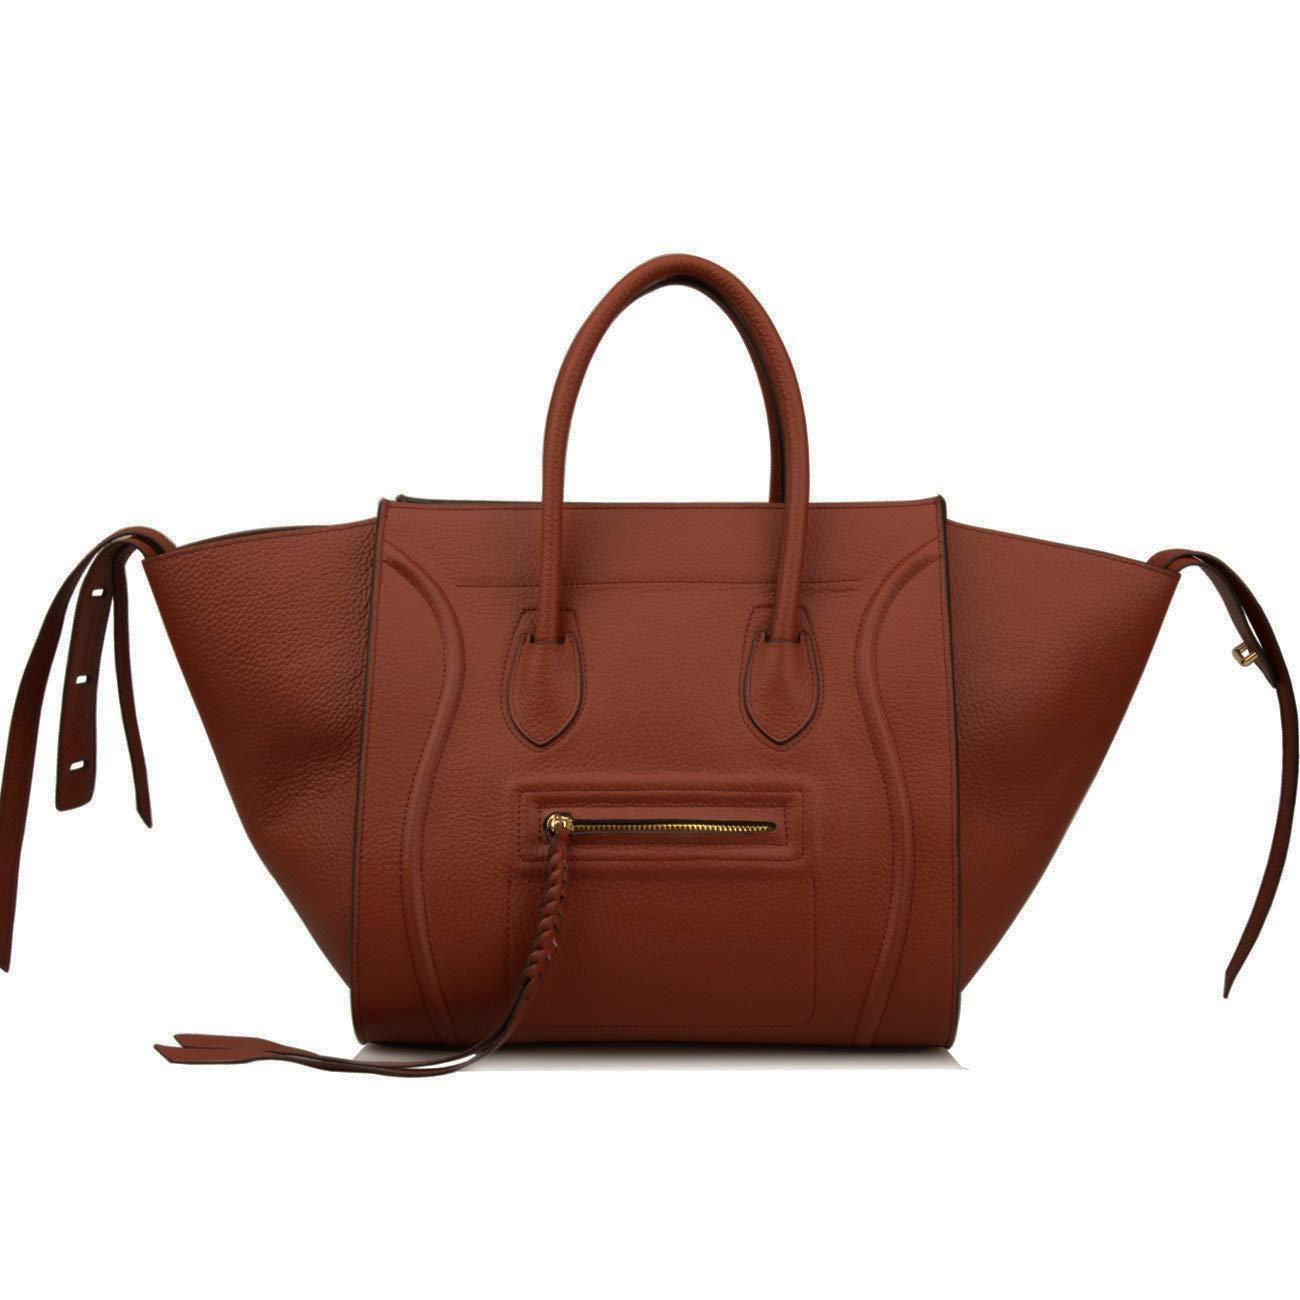 Ainifeel Women's Genuine Leather Bat Oversize Tote Bag Purse Handbags (X-large (Oversize), Brownish red)